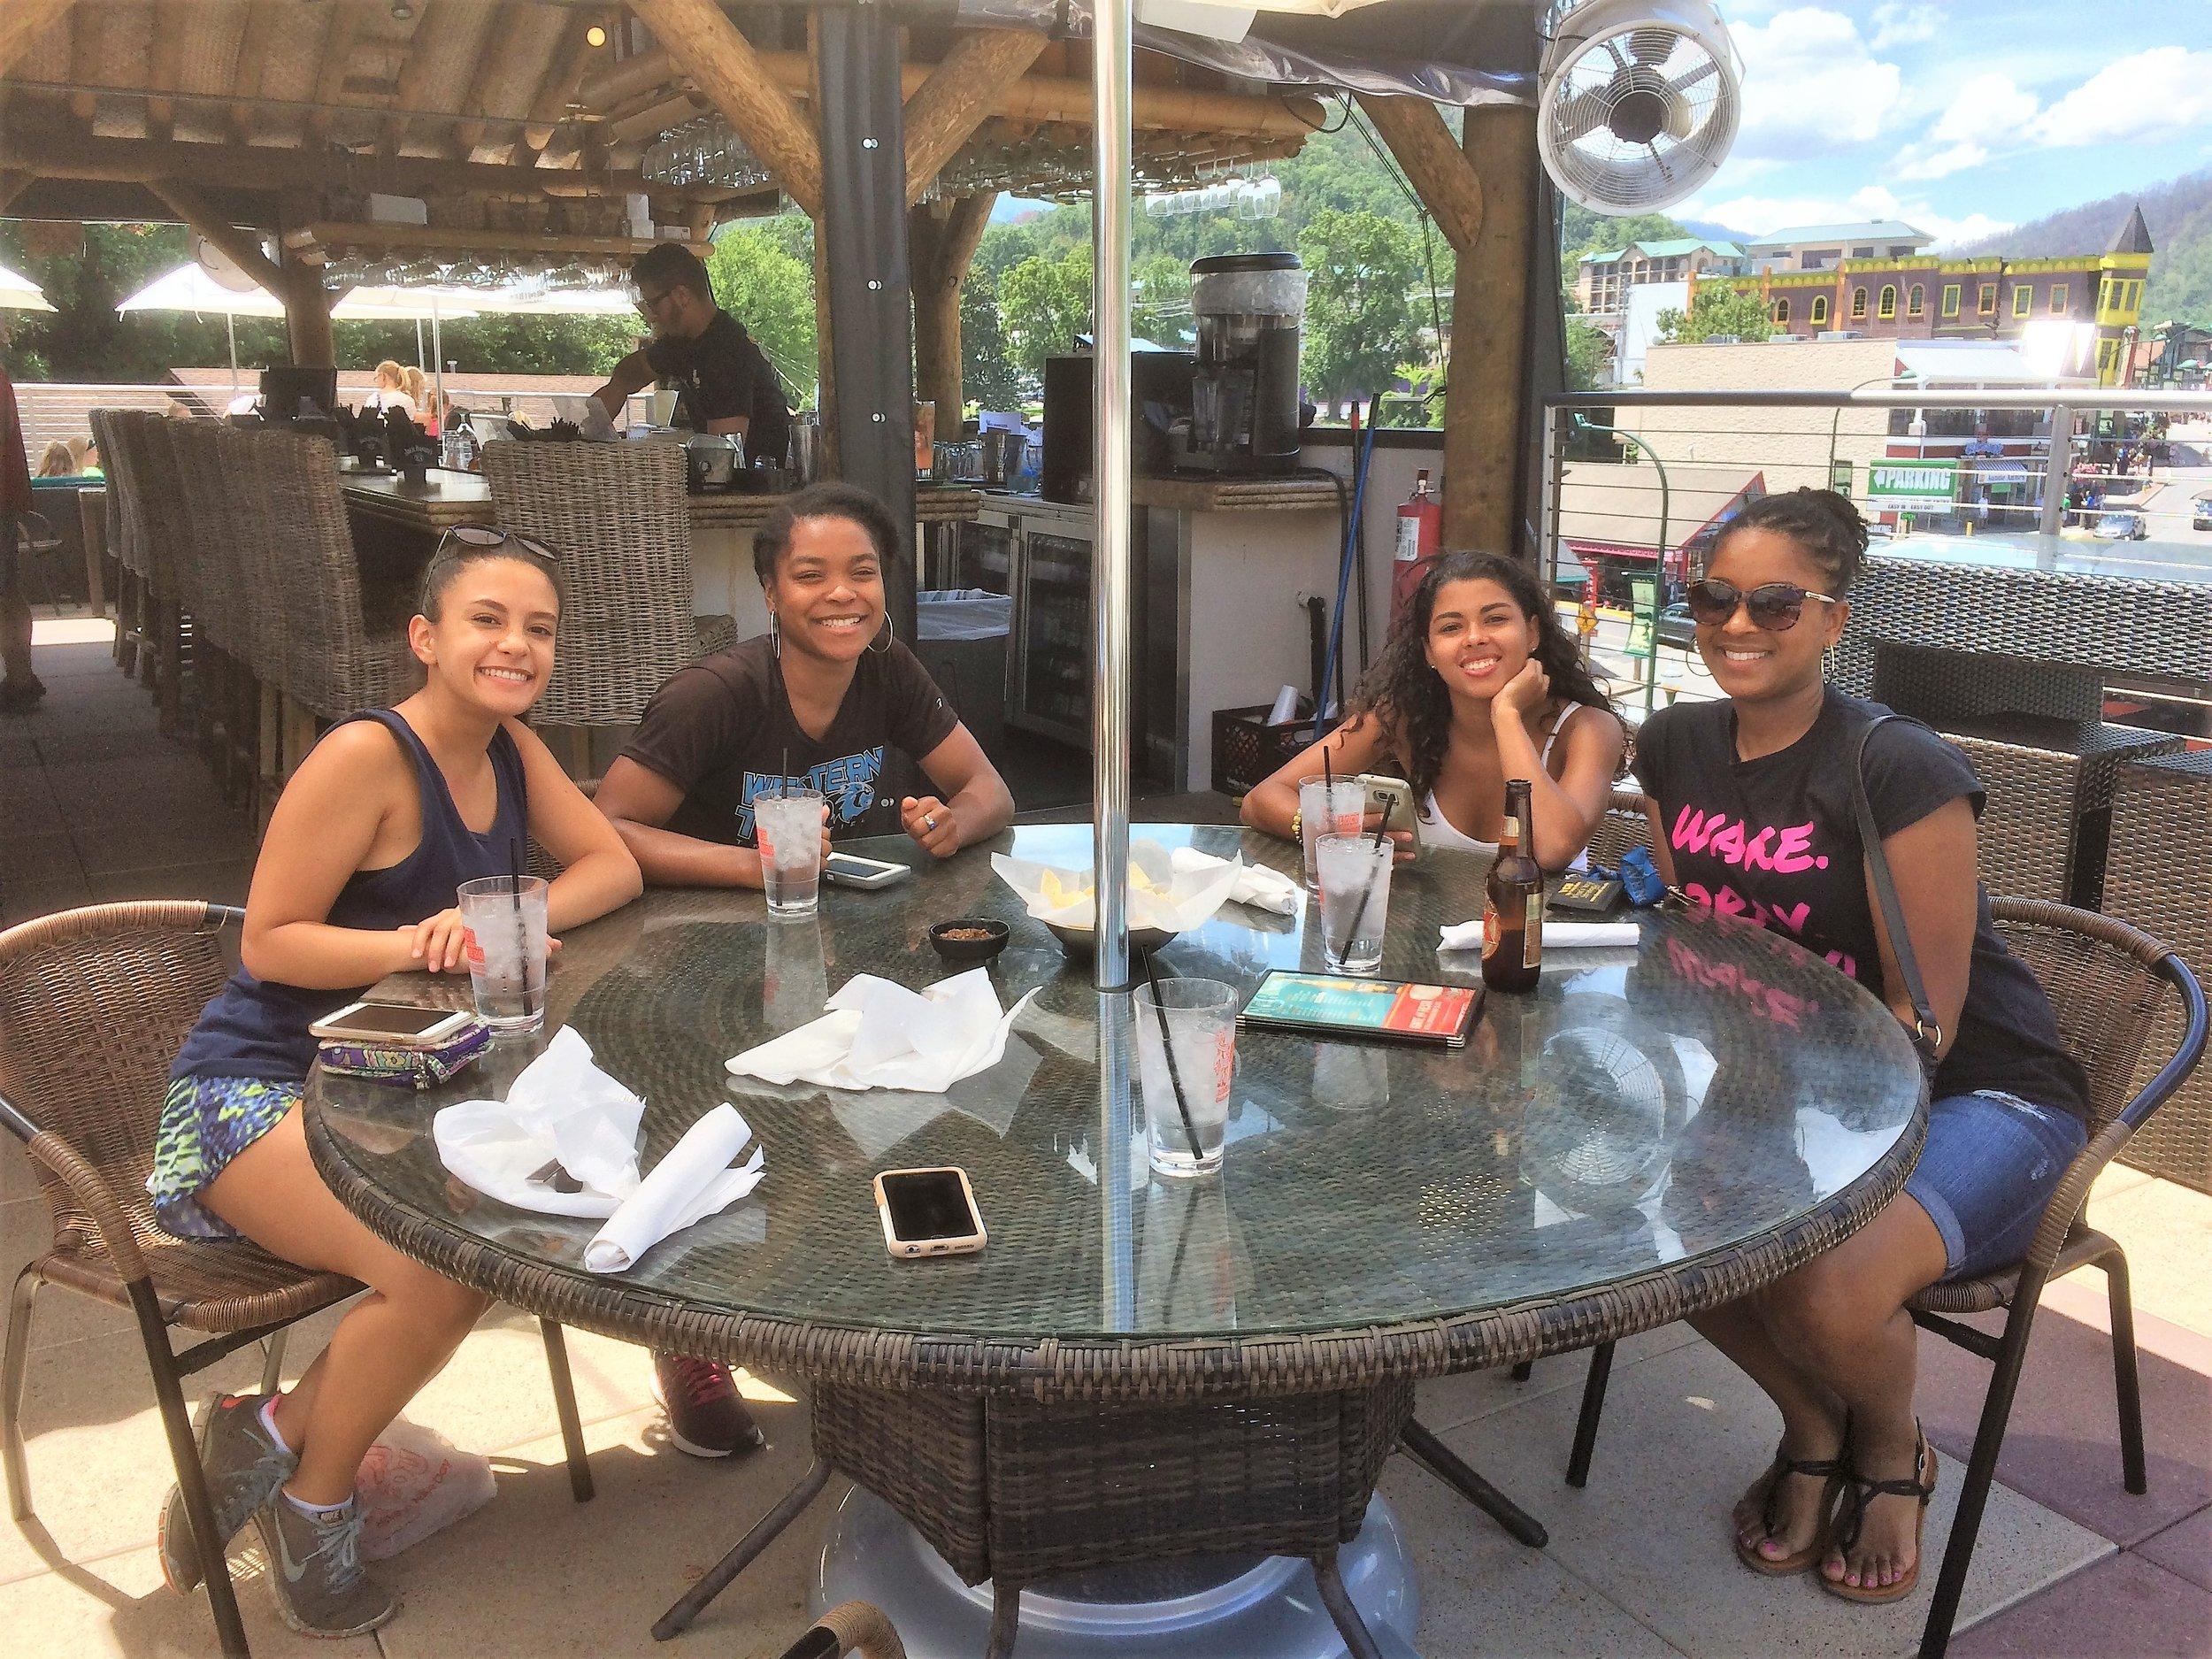 Rooftop lunch in Gatlinburg, TN with the 2017 Team: (left-right) Serena Moncion, Daijona Revell, Raquel Wetzell, and Felisha Walls.